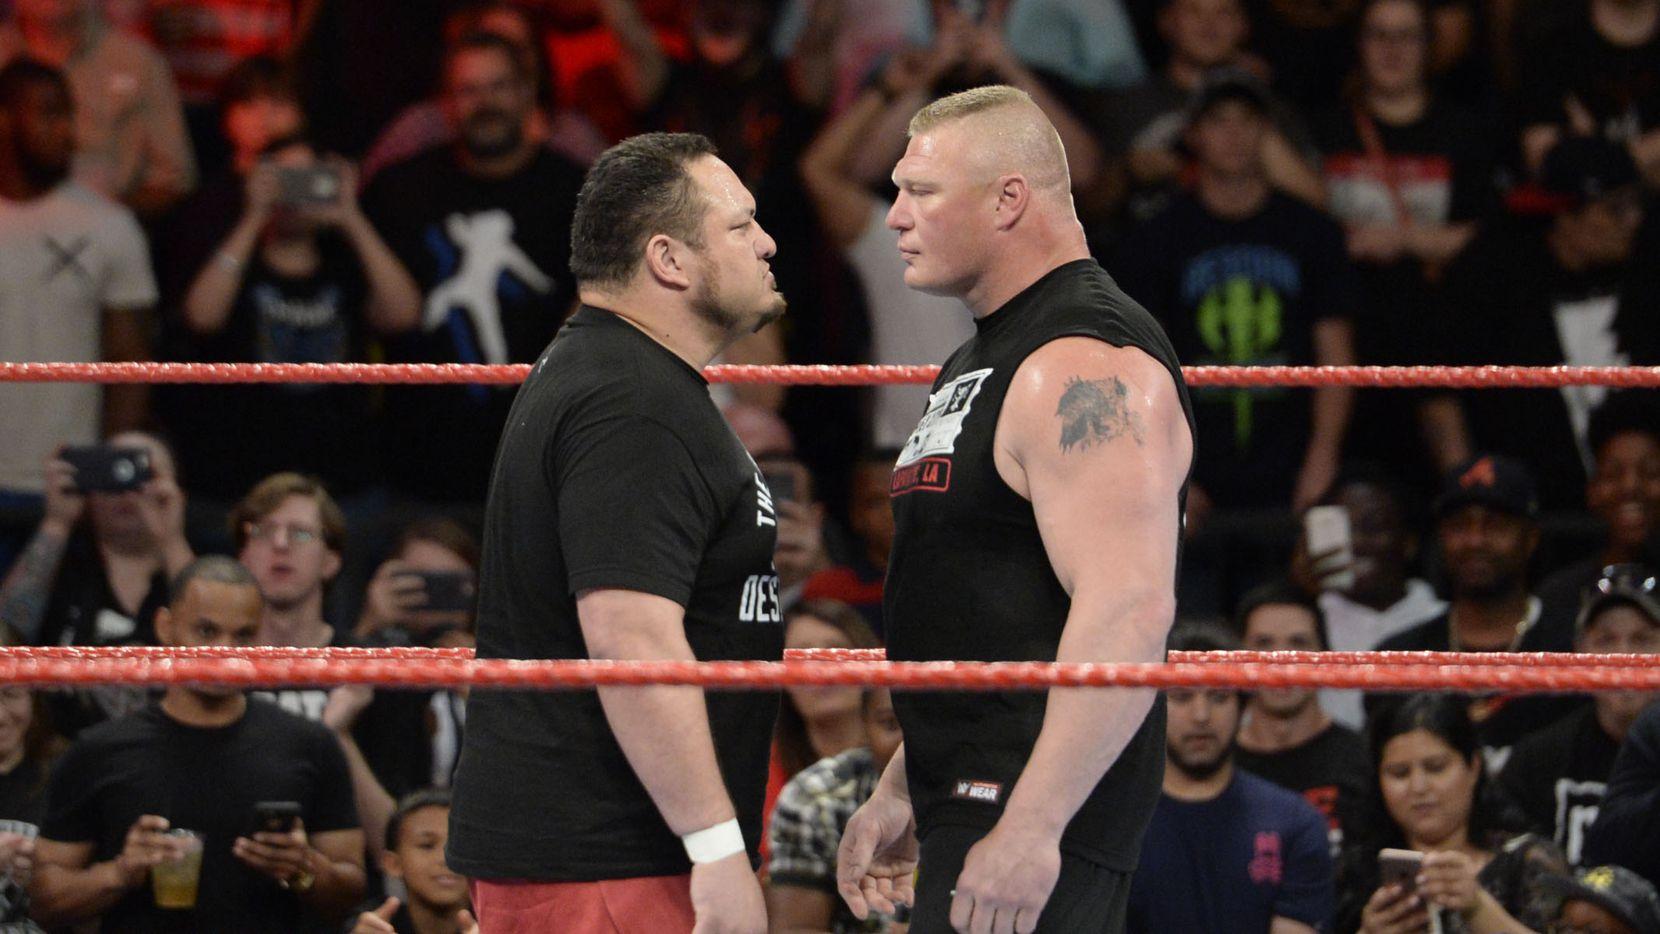 No. 1 contender Samoa Joe (left) stares down WWE universal champion Brock Lesnar (right) on Monday Night Raw.